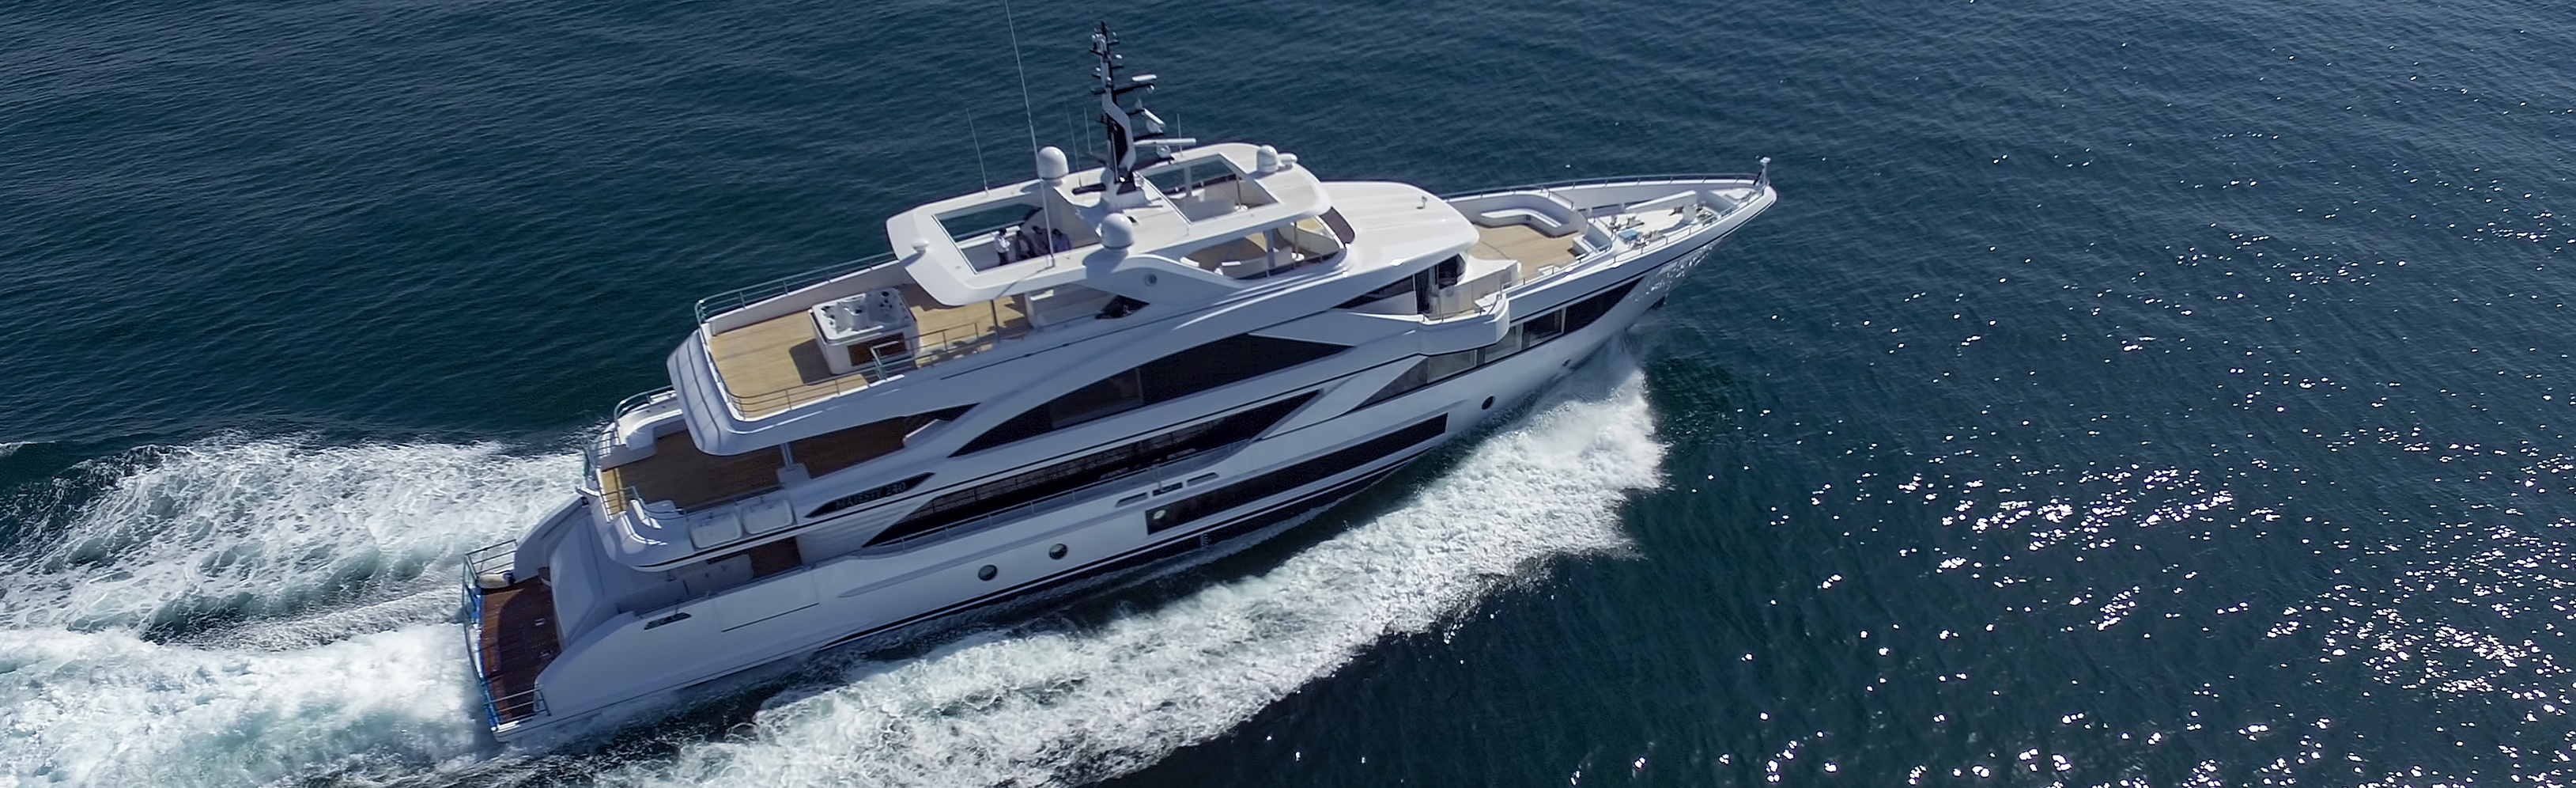 Majesty-140-profile